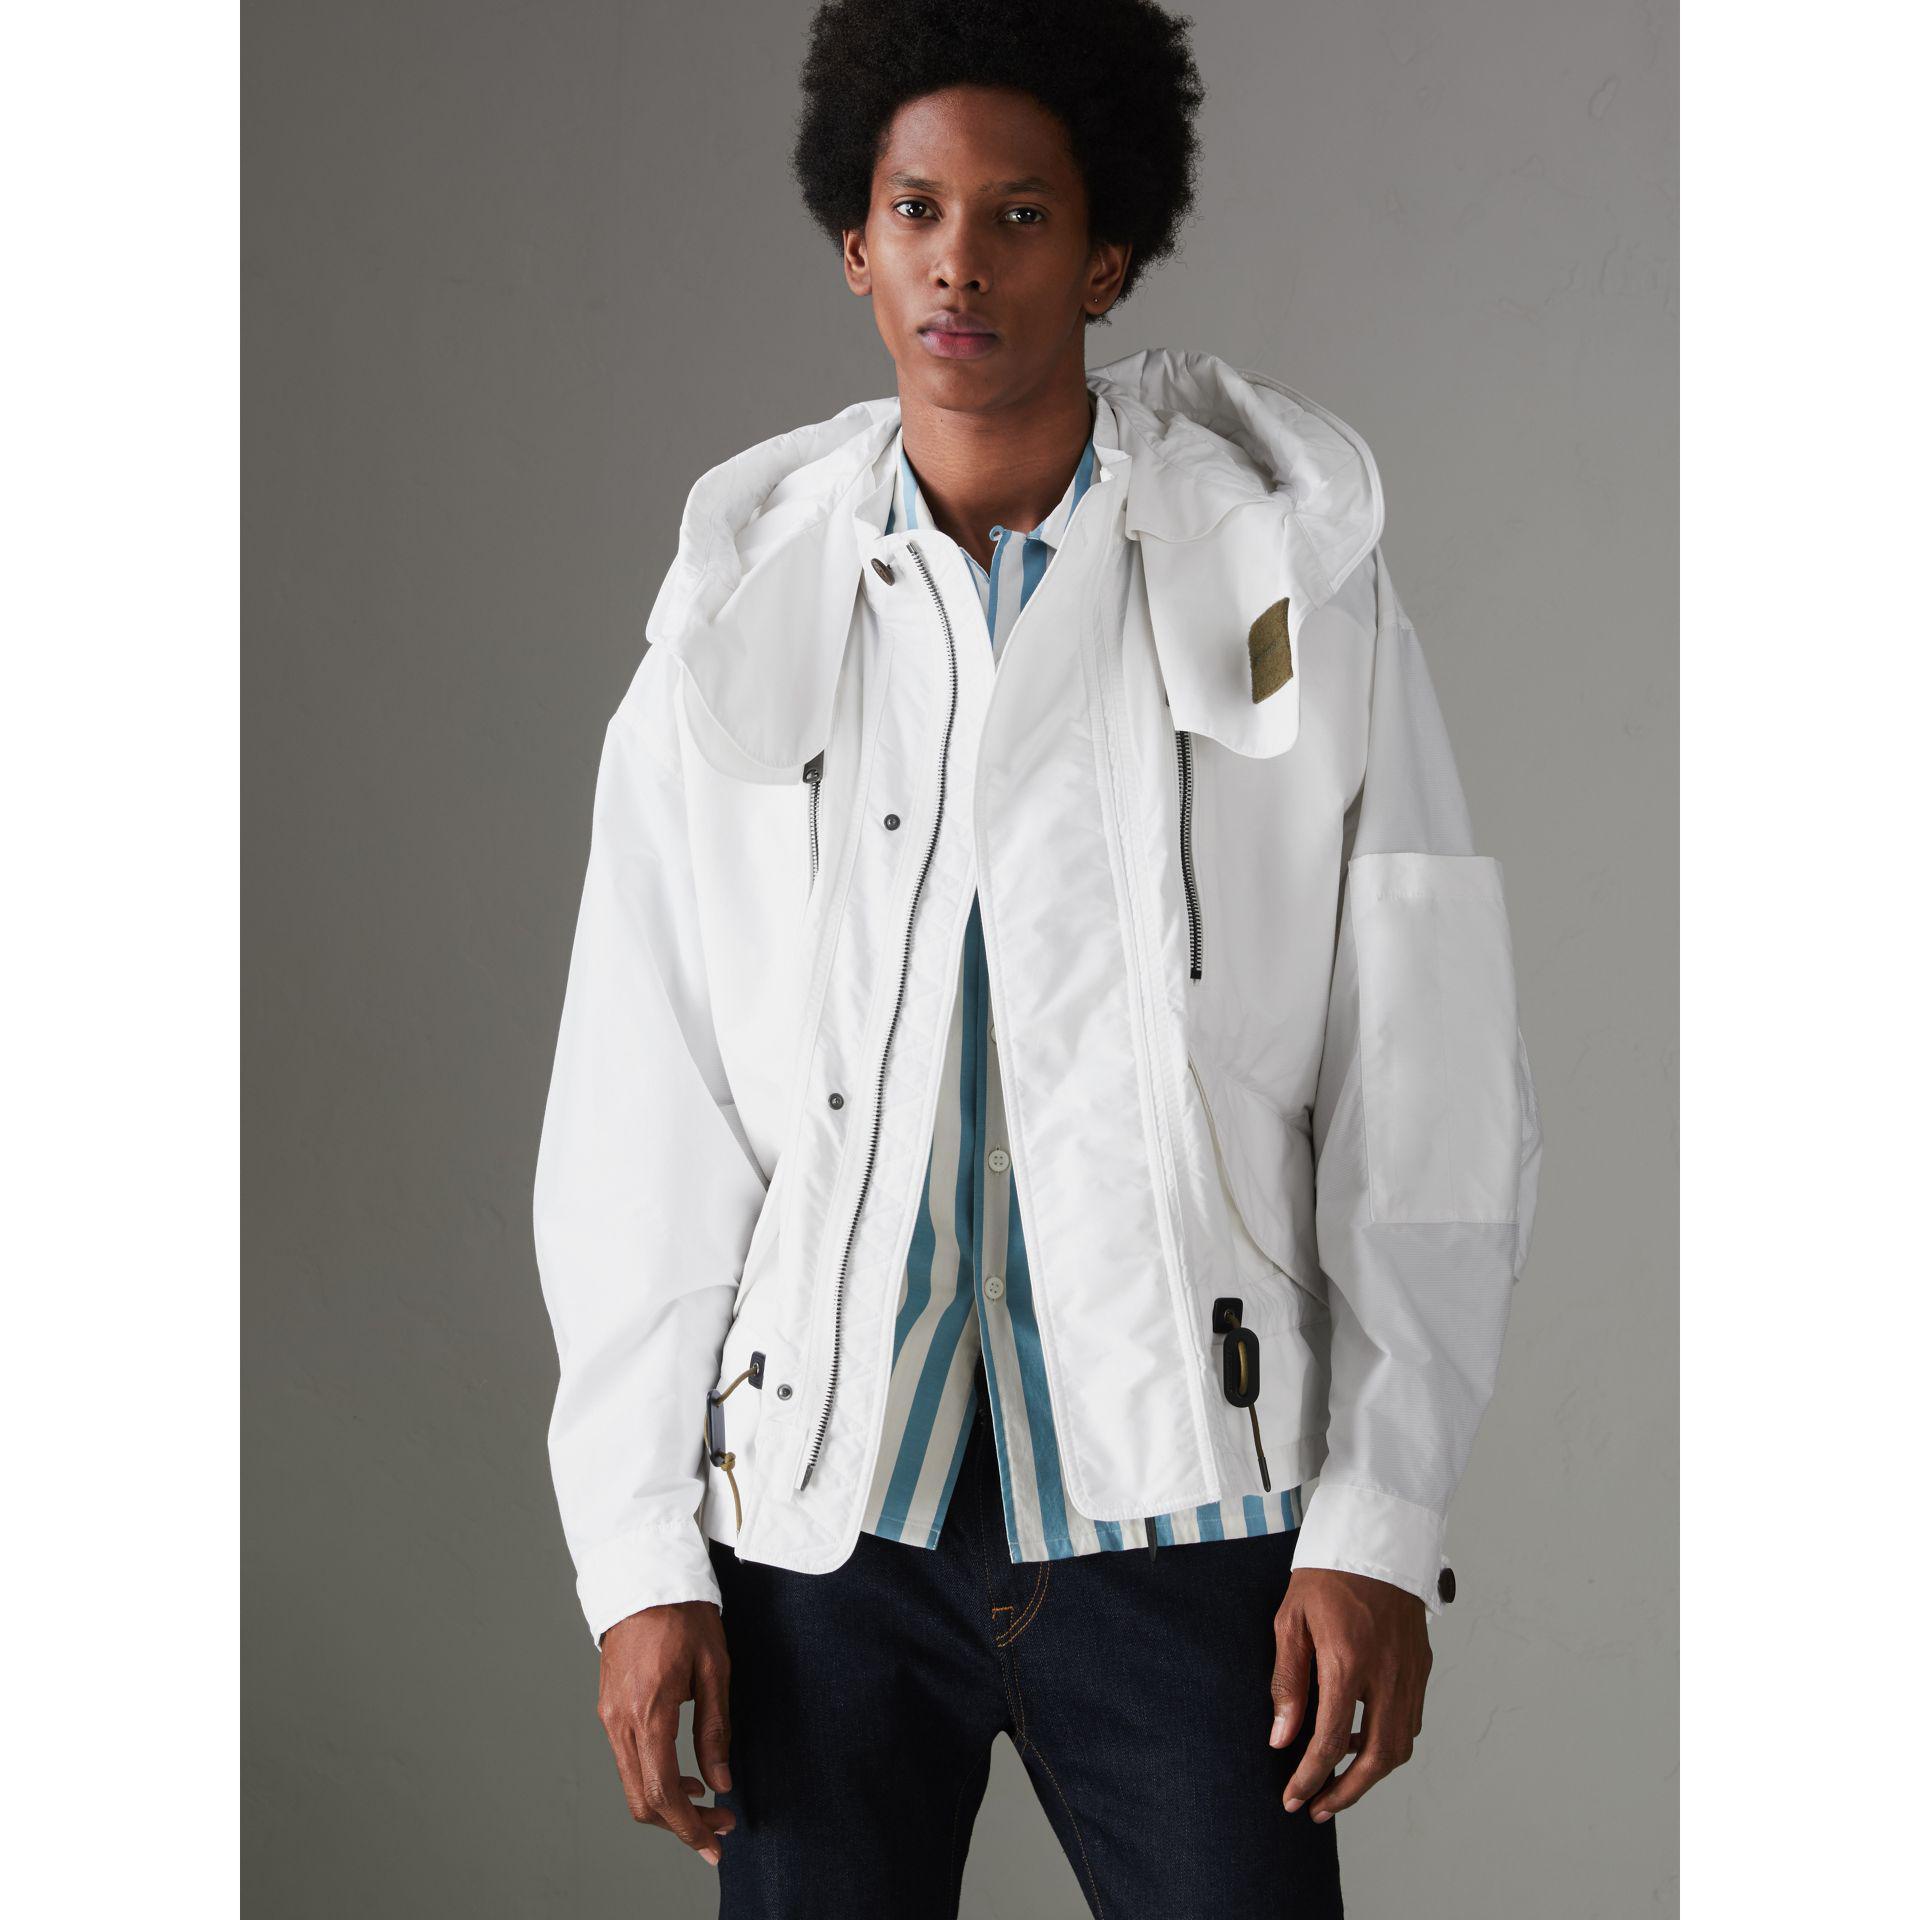 Burberry Cotton Detachable Hood Faille Jacket in White for Men